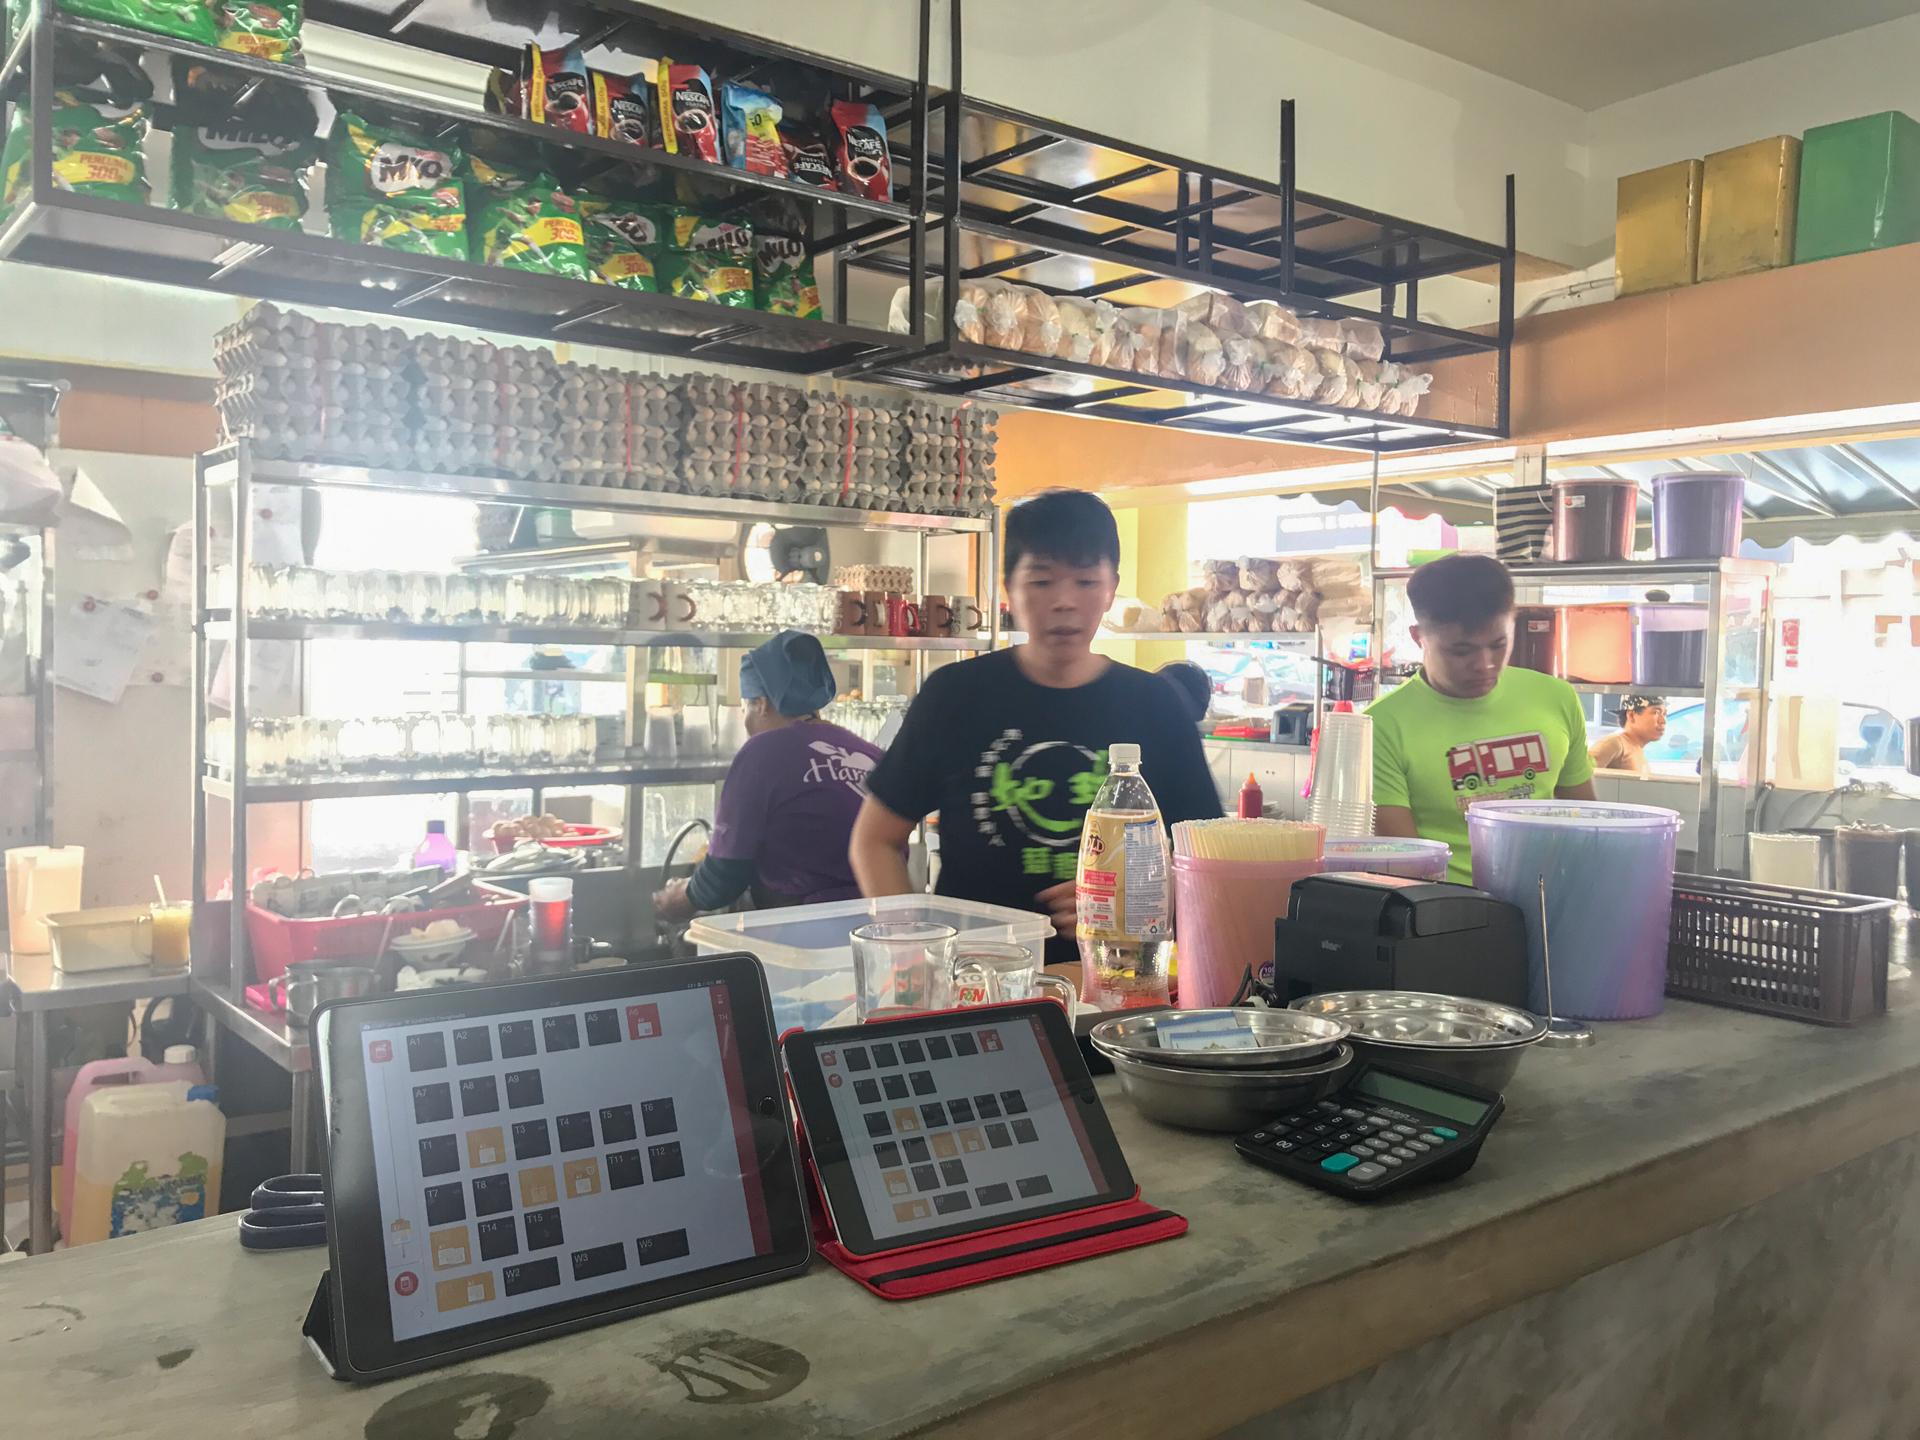 Thong Kee Cafe 使用母機與子機各一台,直接將小台的 iPad mini 帶到桌邊就能點餐